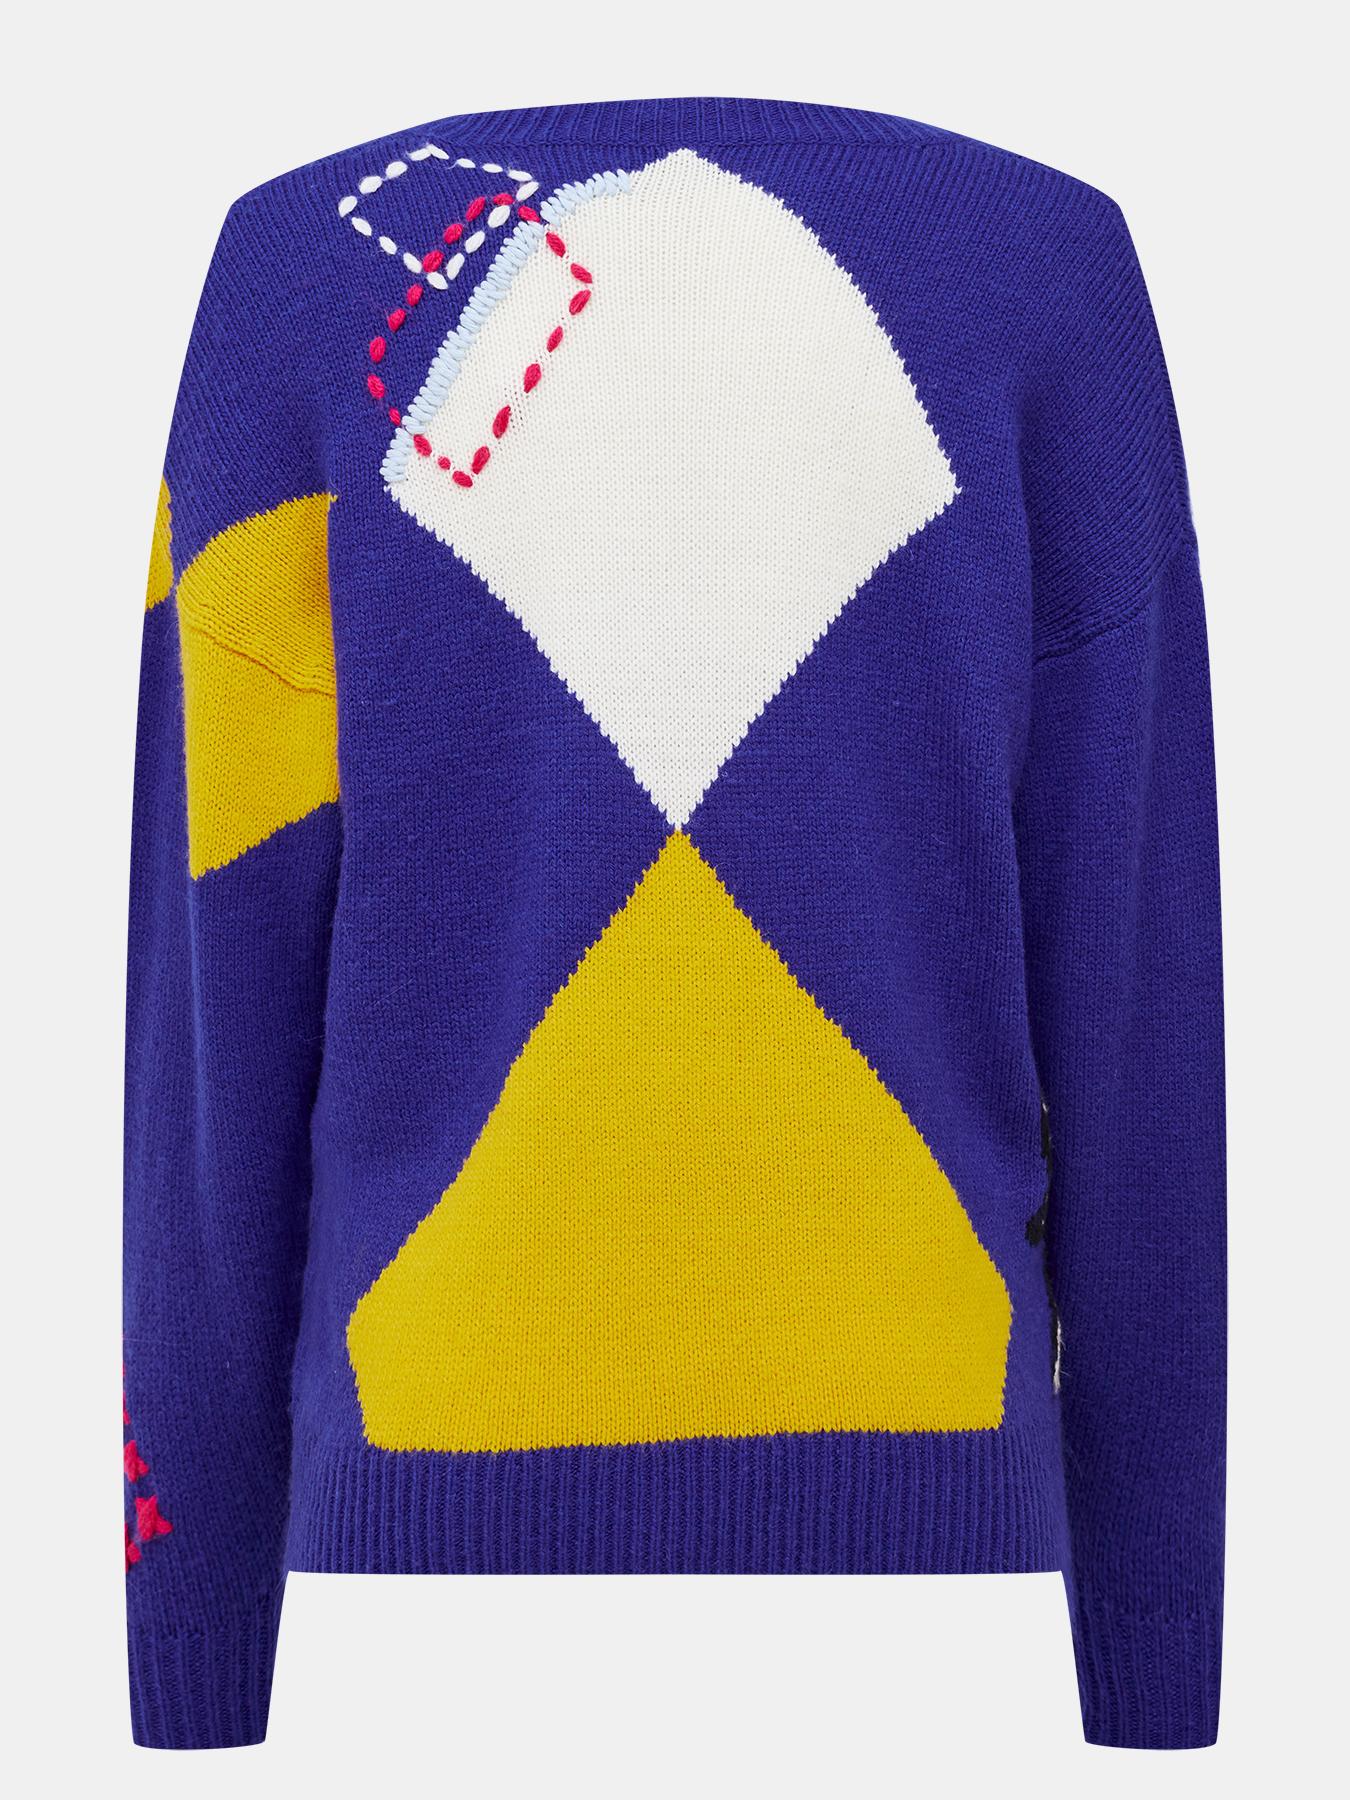 Пуловер Marc Cain Пуловер пуловер stradivarius stradivarius ix001xw004xq